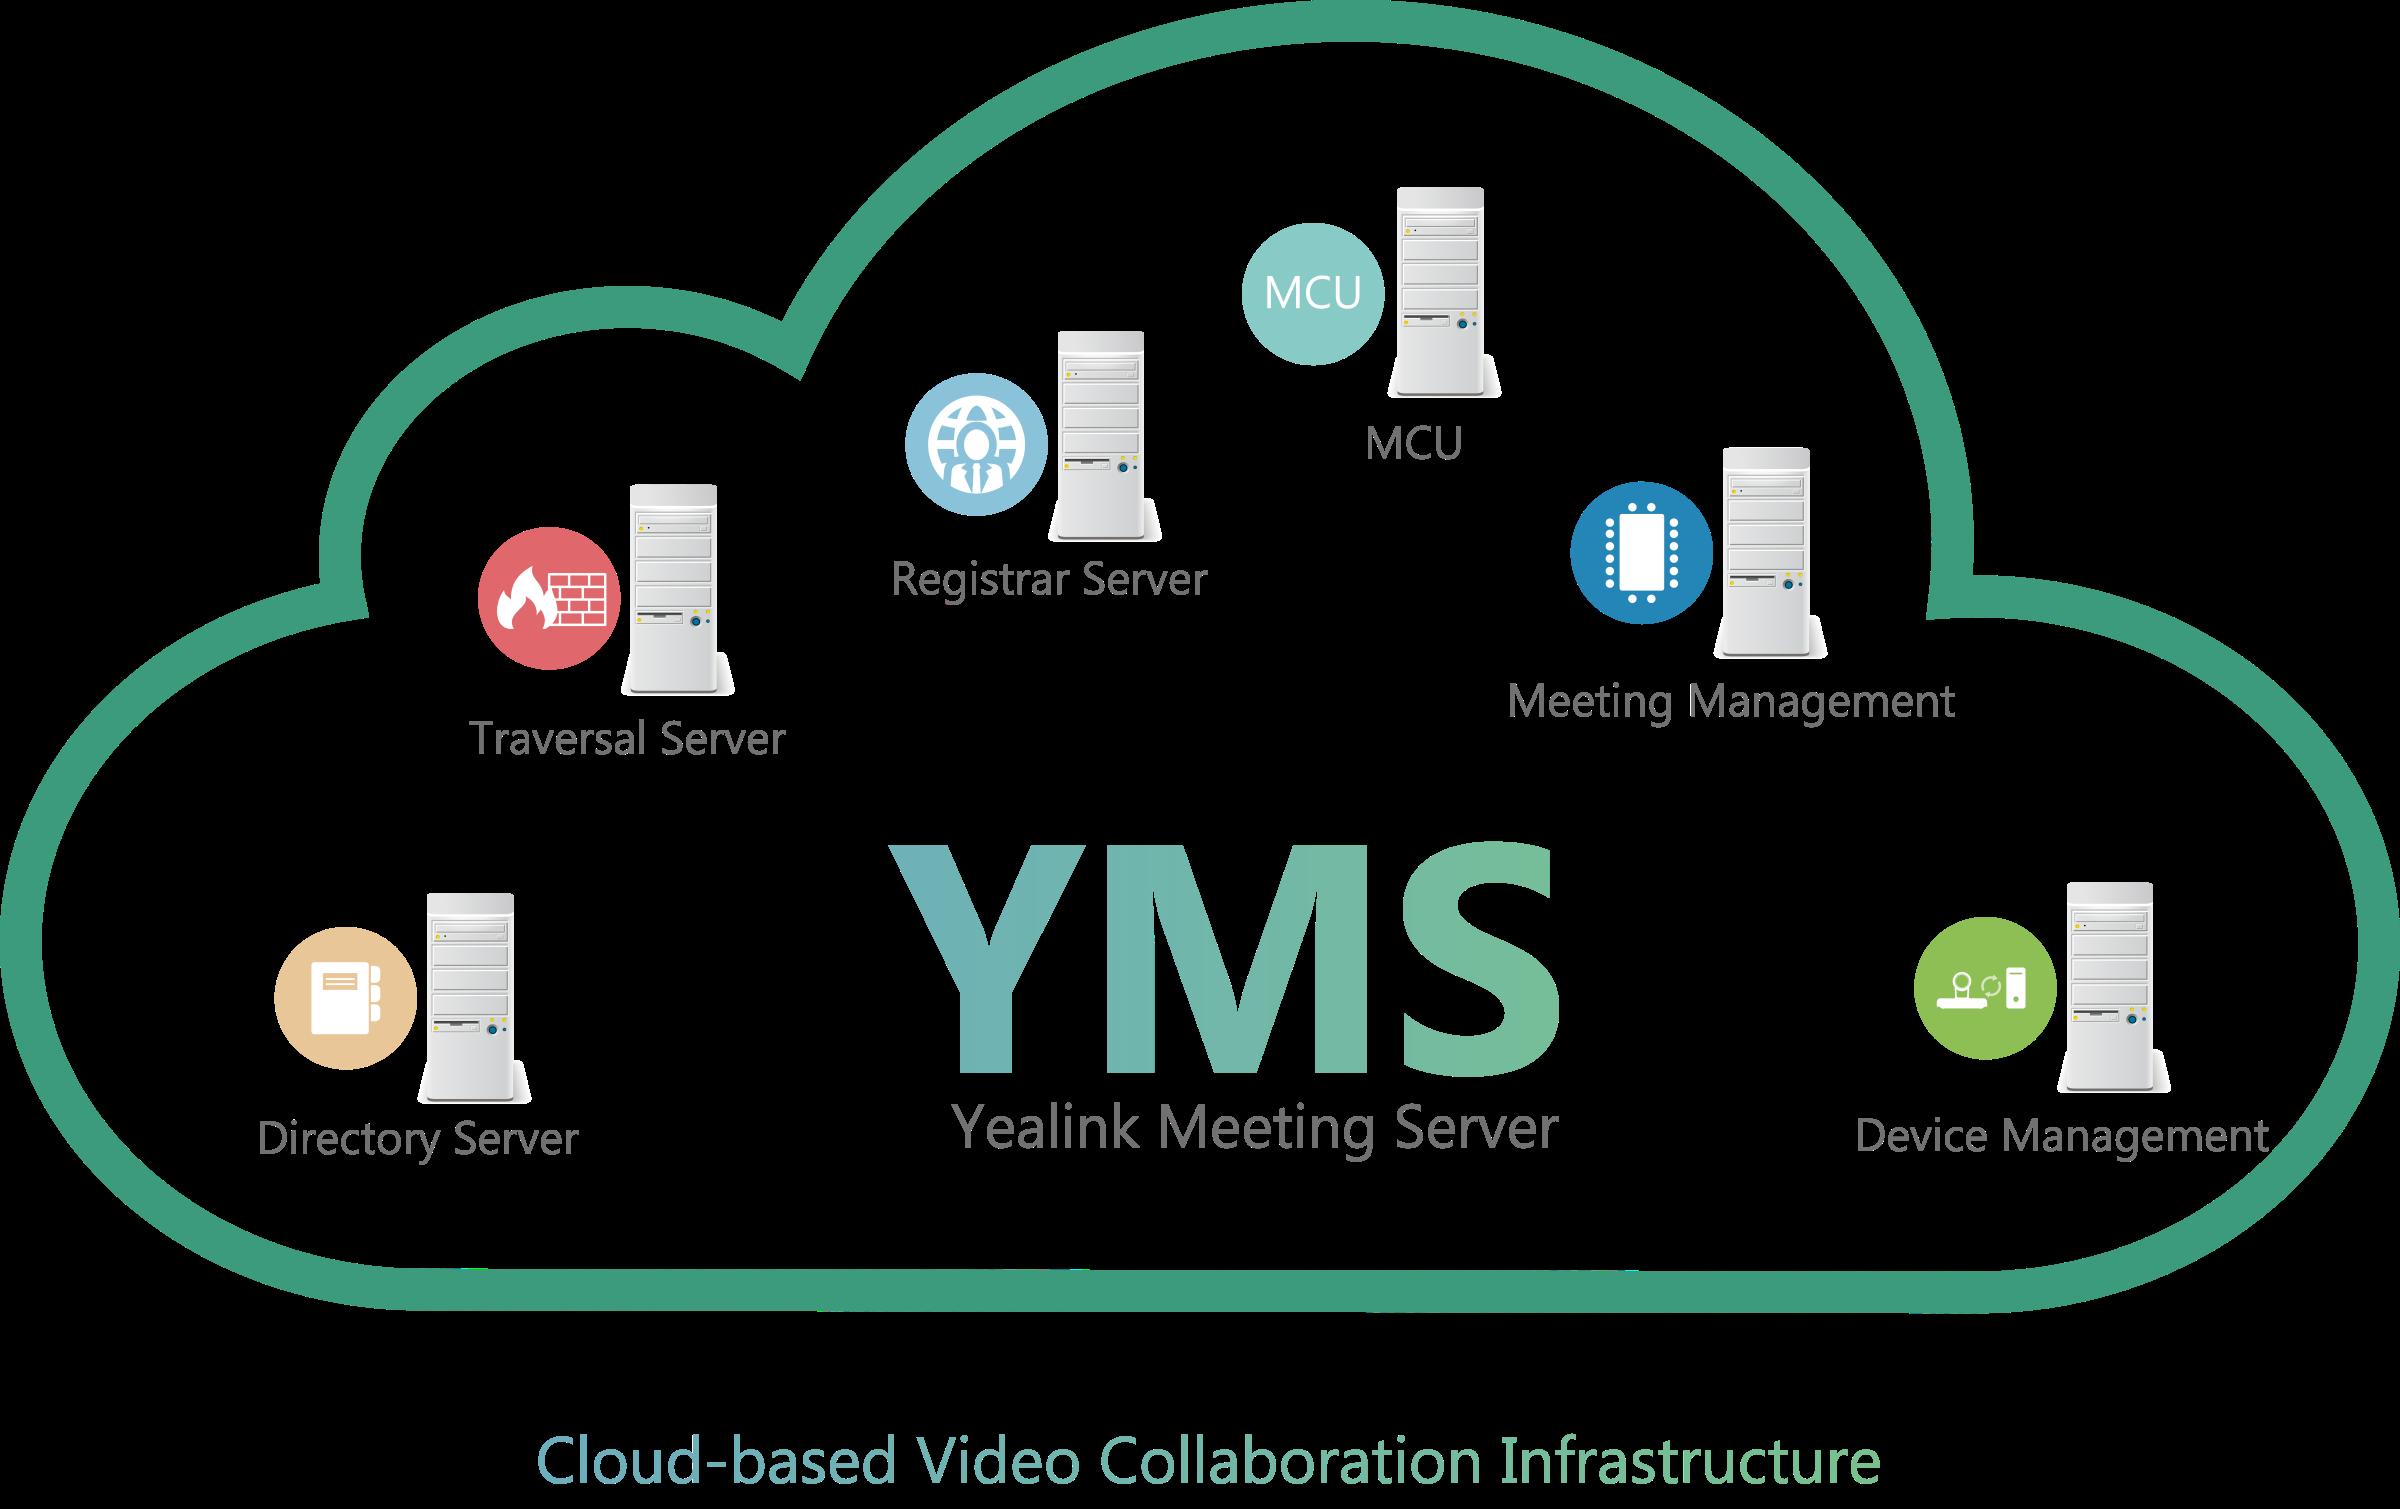 Yealink Meeting Server (YMS)